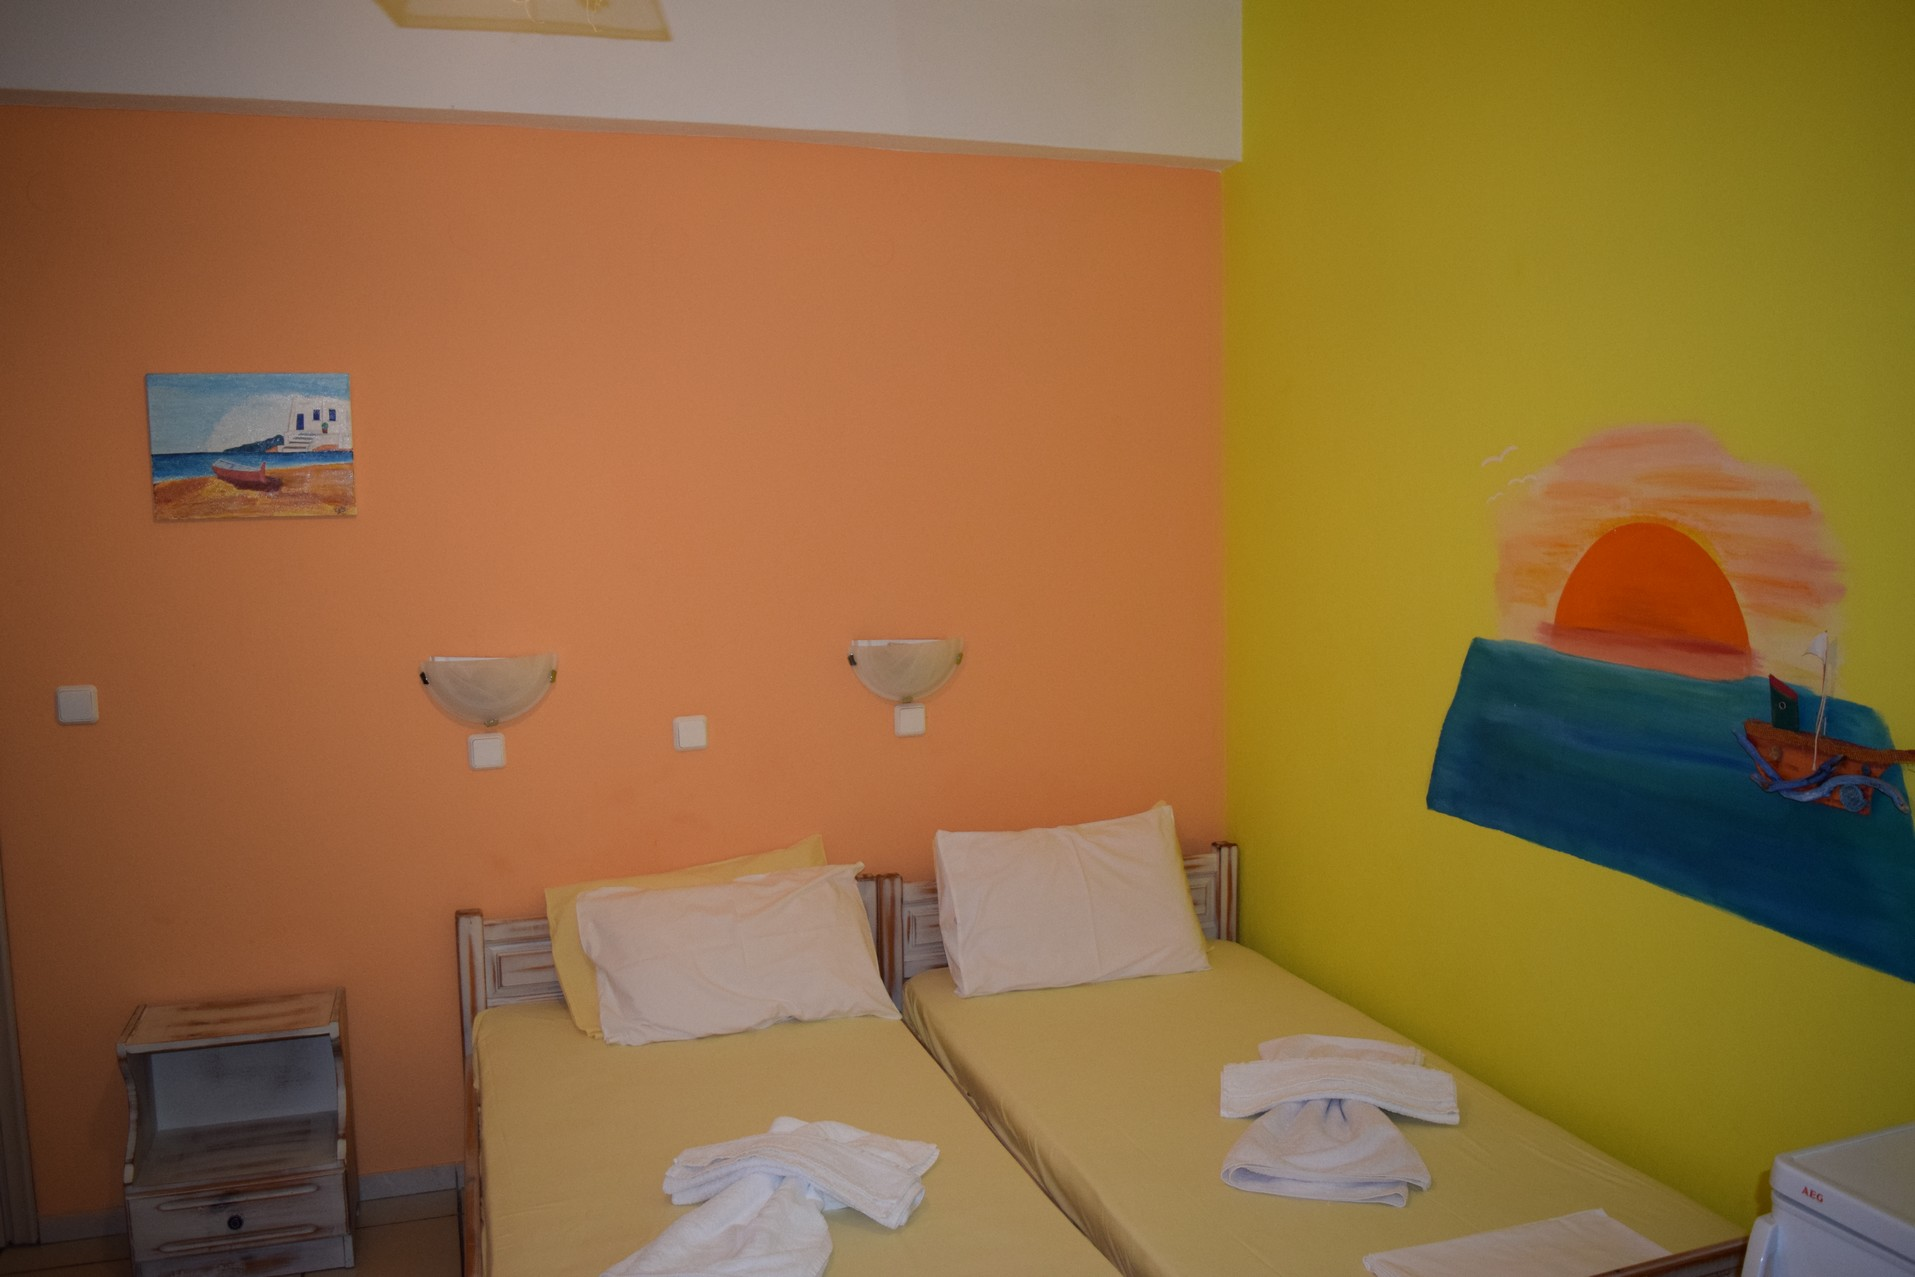 Thassos anastasia room